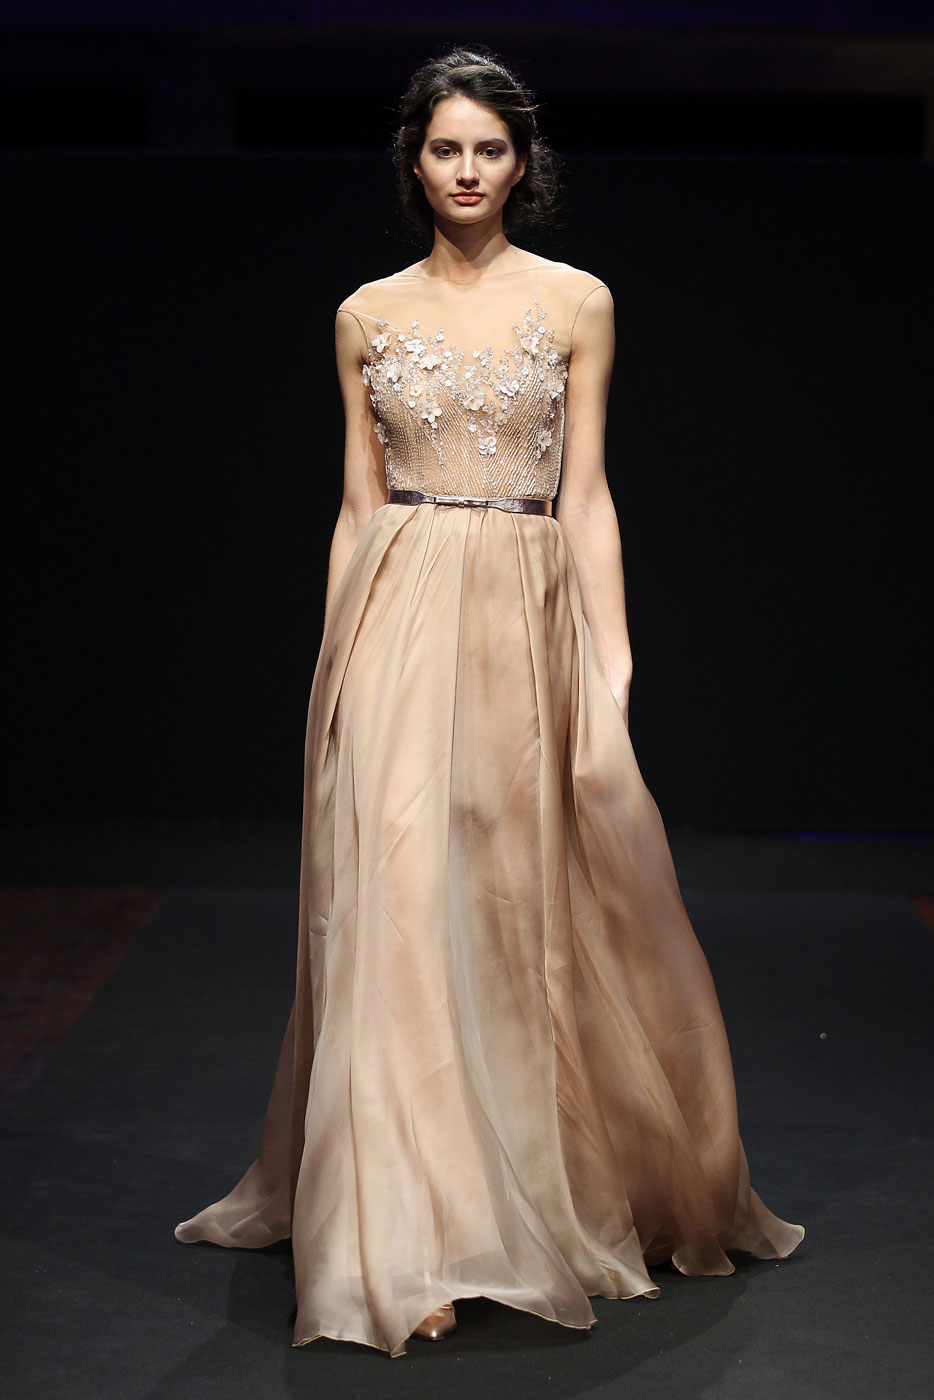 Abed-Mahfouz-fashion-runway-show-haute-couture-paris-spring-2015-the-impression-27